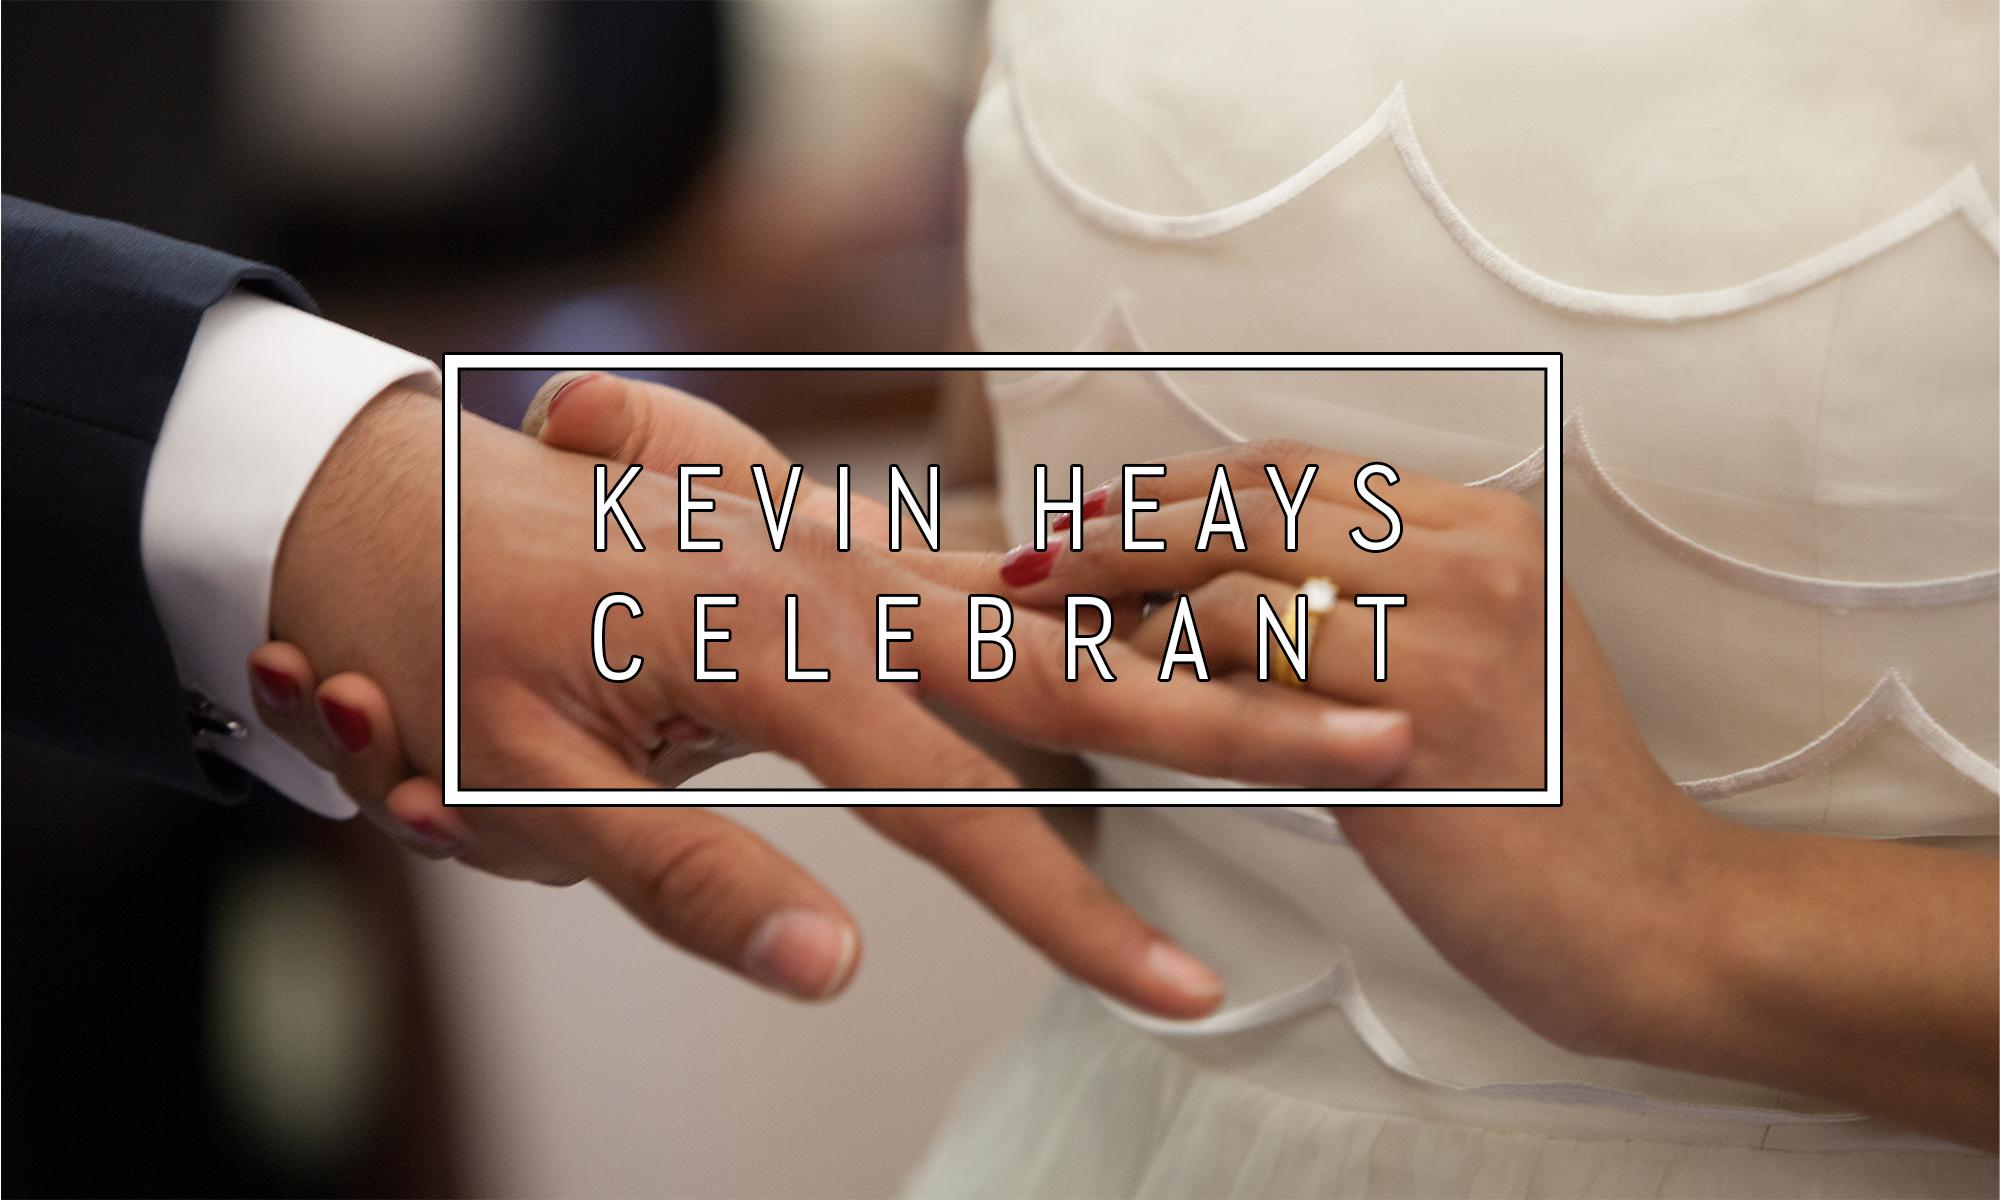 Kevin Heays Celebrant